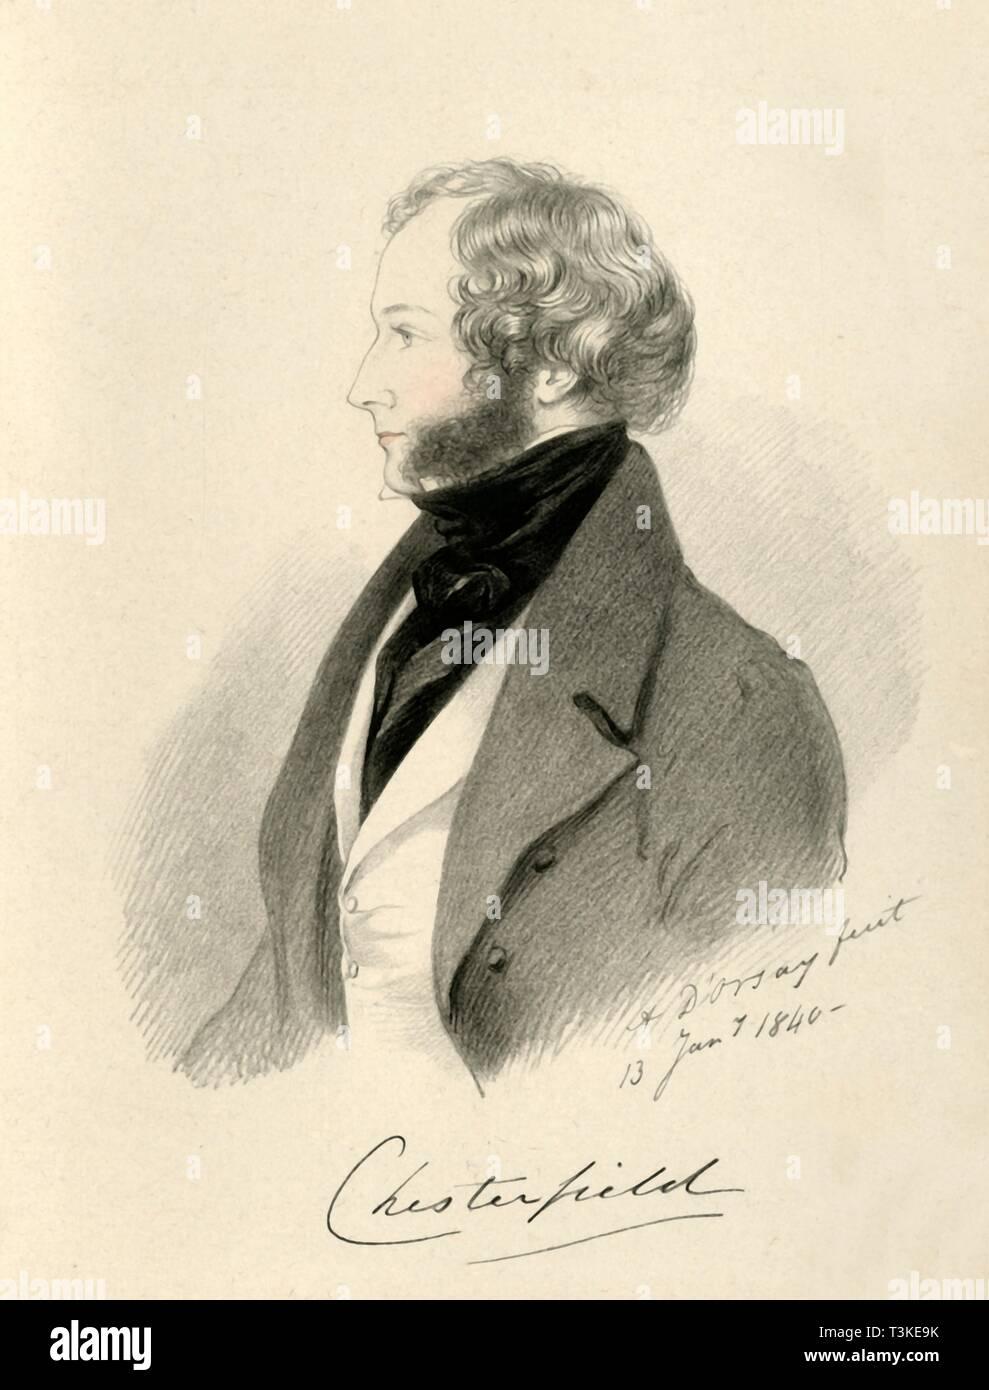 'The Earl of Chesterfield', 1840. Creator: Richard James Lane. Stock Photo